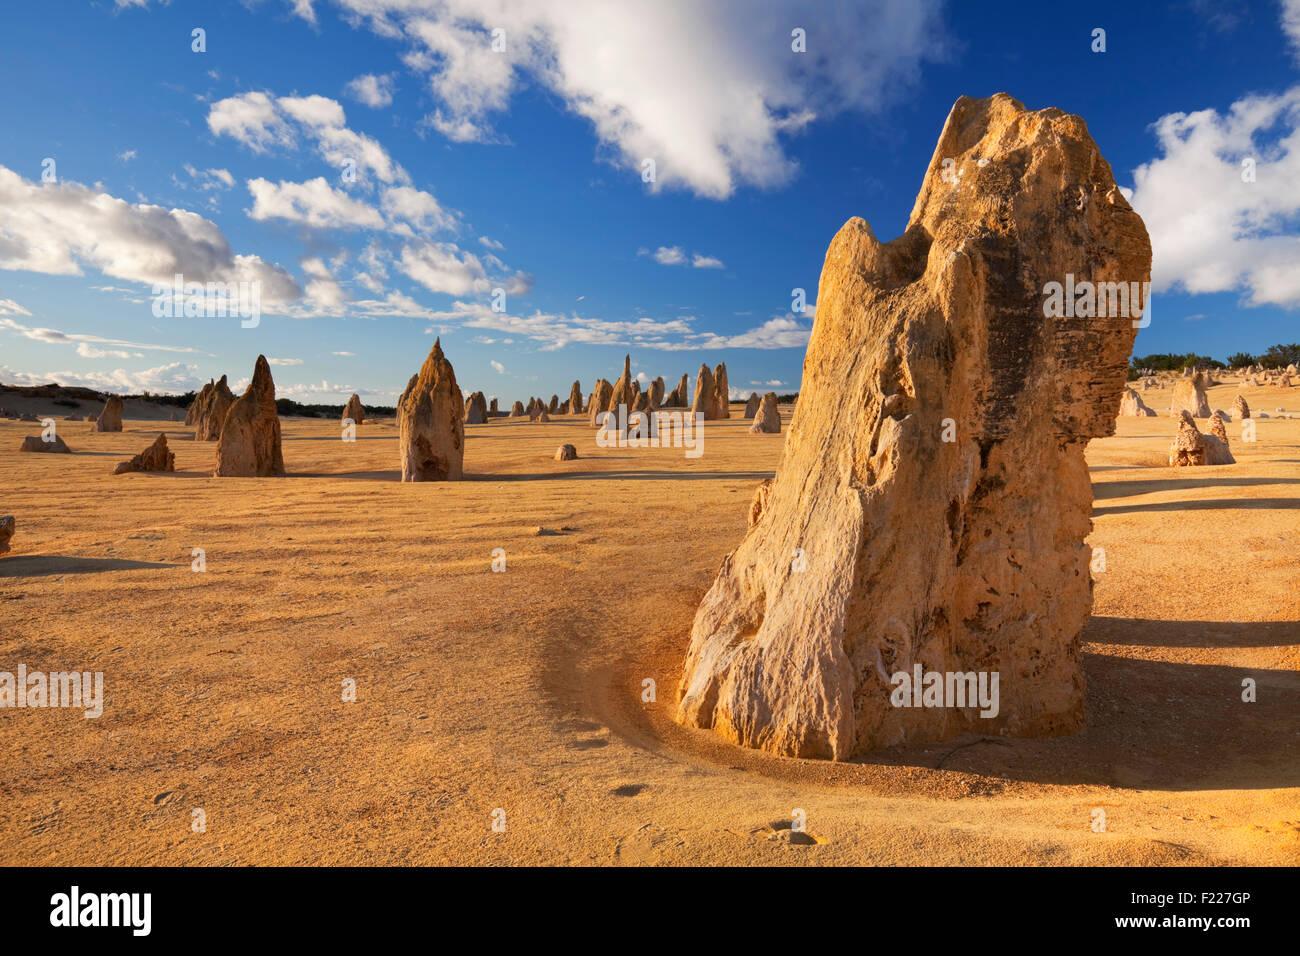 The Pinnacles Desert in the Nambung National Park, Western Australia. - Stock Image